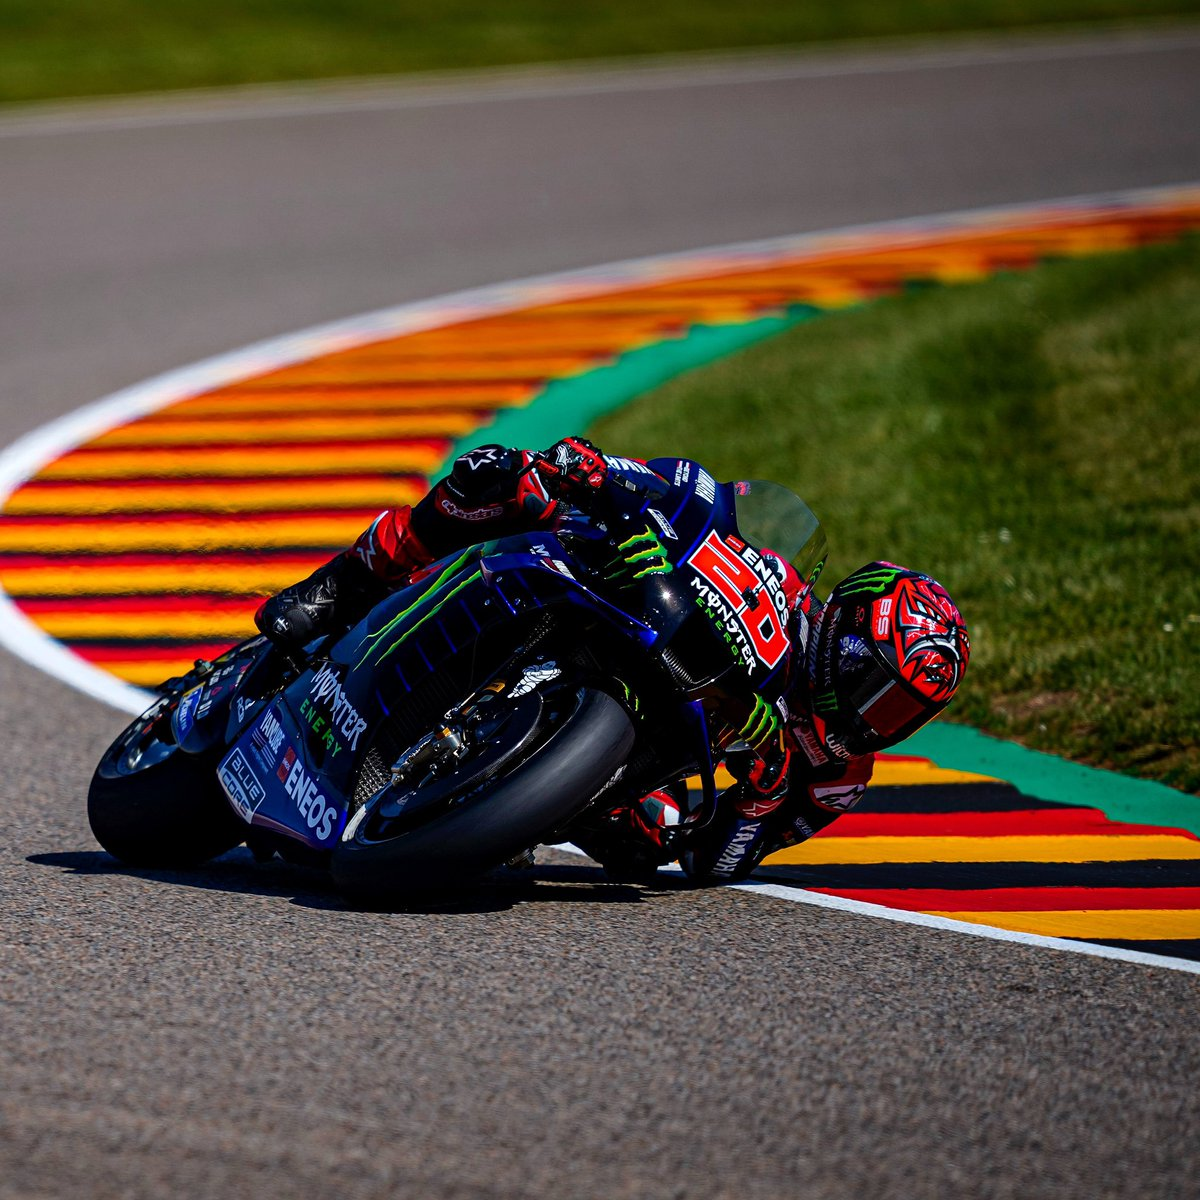 Pembalap Monster Energy Yamaha, Fabio Quartararo, sukses keluar sebagai pemenang pada balapan seri kesembilan MotoGP Belanda 2021. Fabio Quartararo menjadi pembalap pertama yang mencapai garis finis pada balapan MotoGP Belanda 2021 yang digelar di Sirkuit Assen, Belanda, Minggu (27/6/2021)